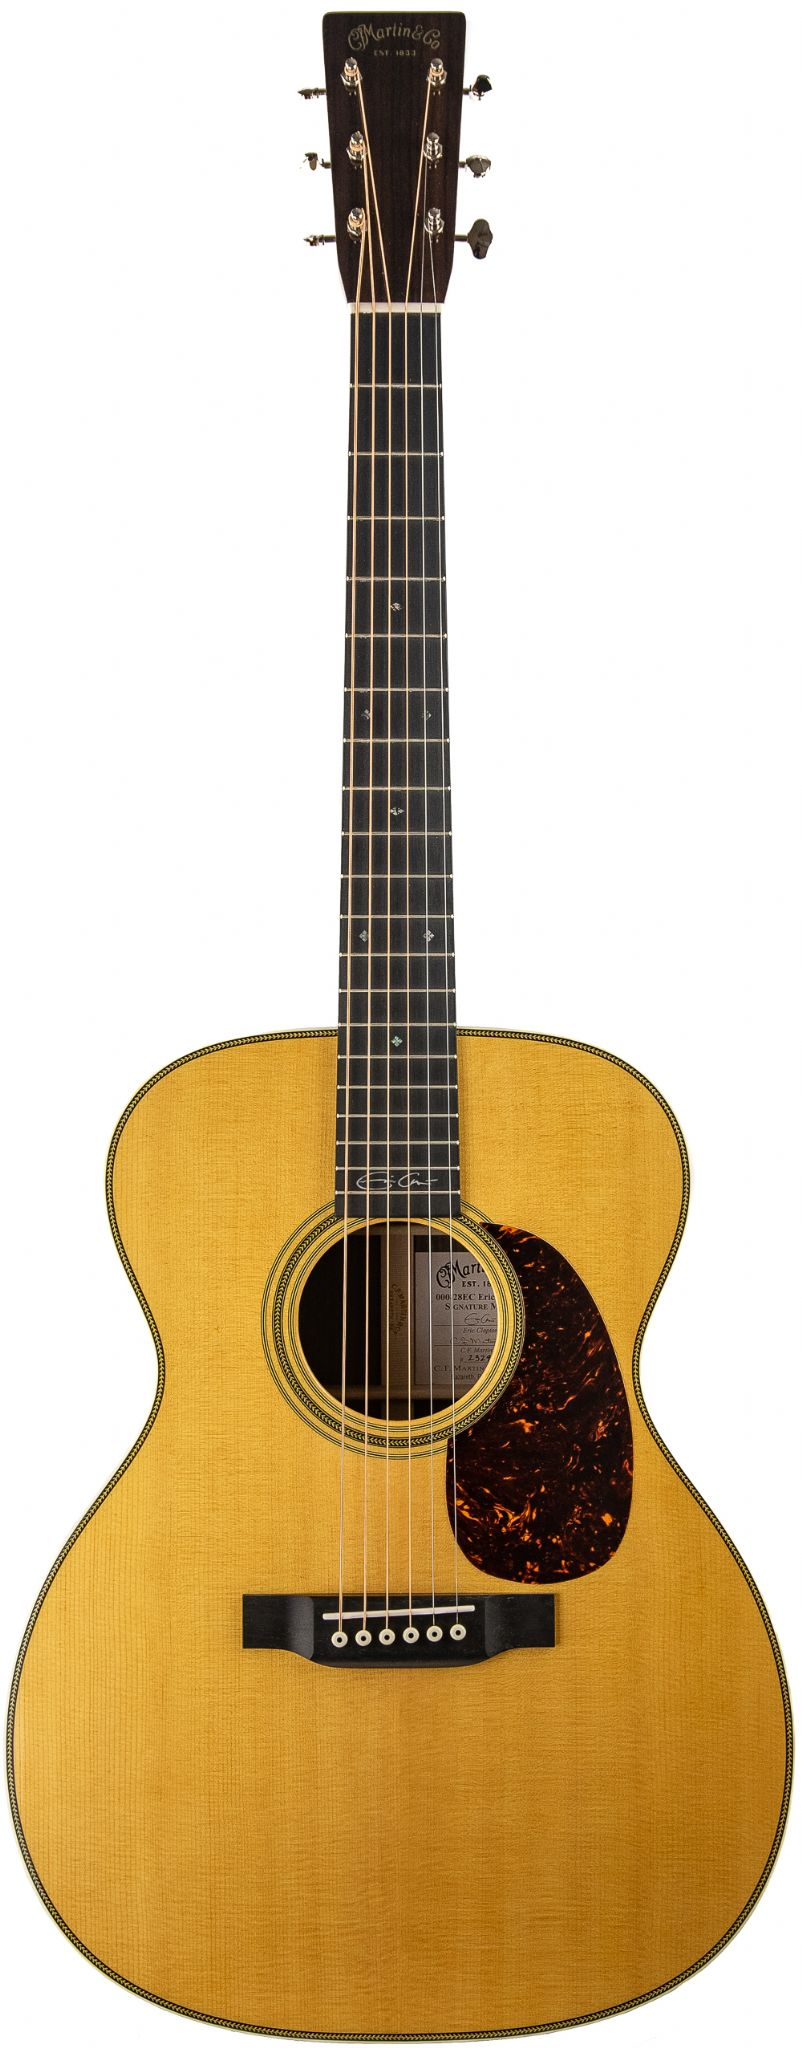 Martin 00028ec Eric Clapton Acoustic Guitar